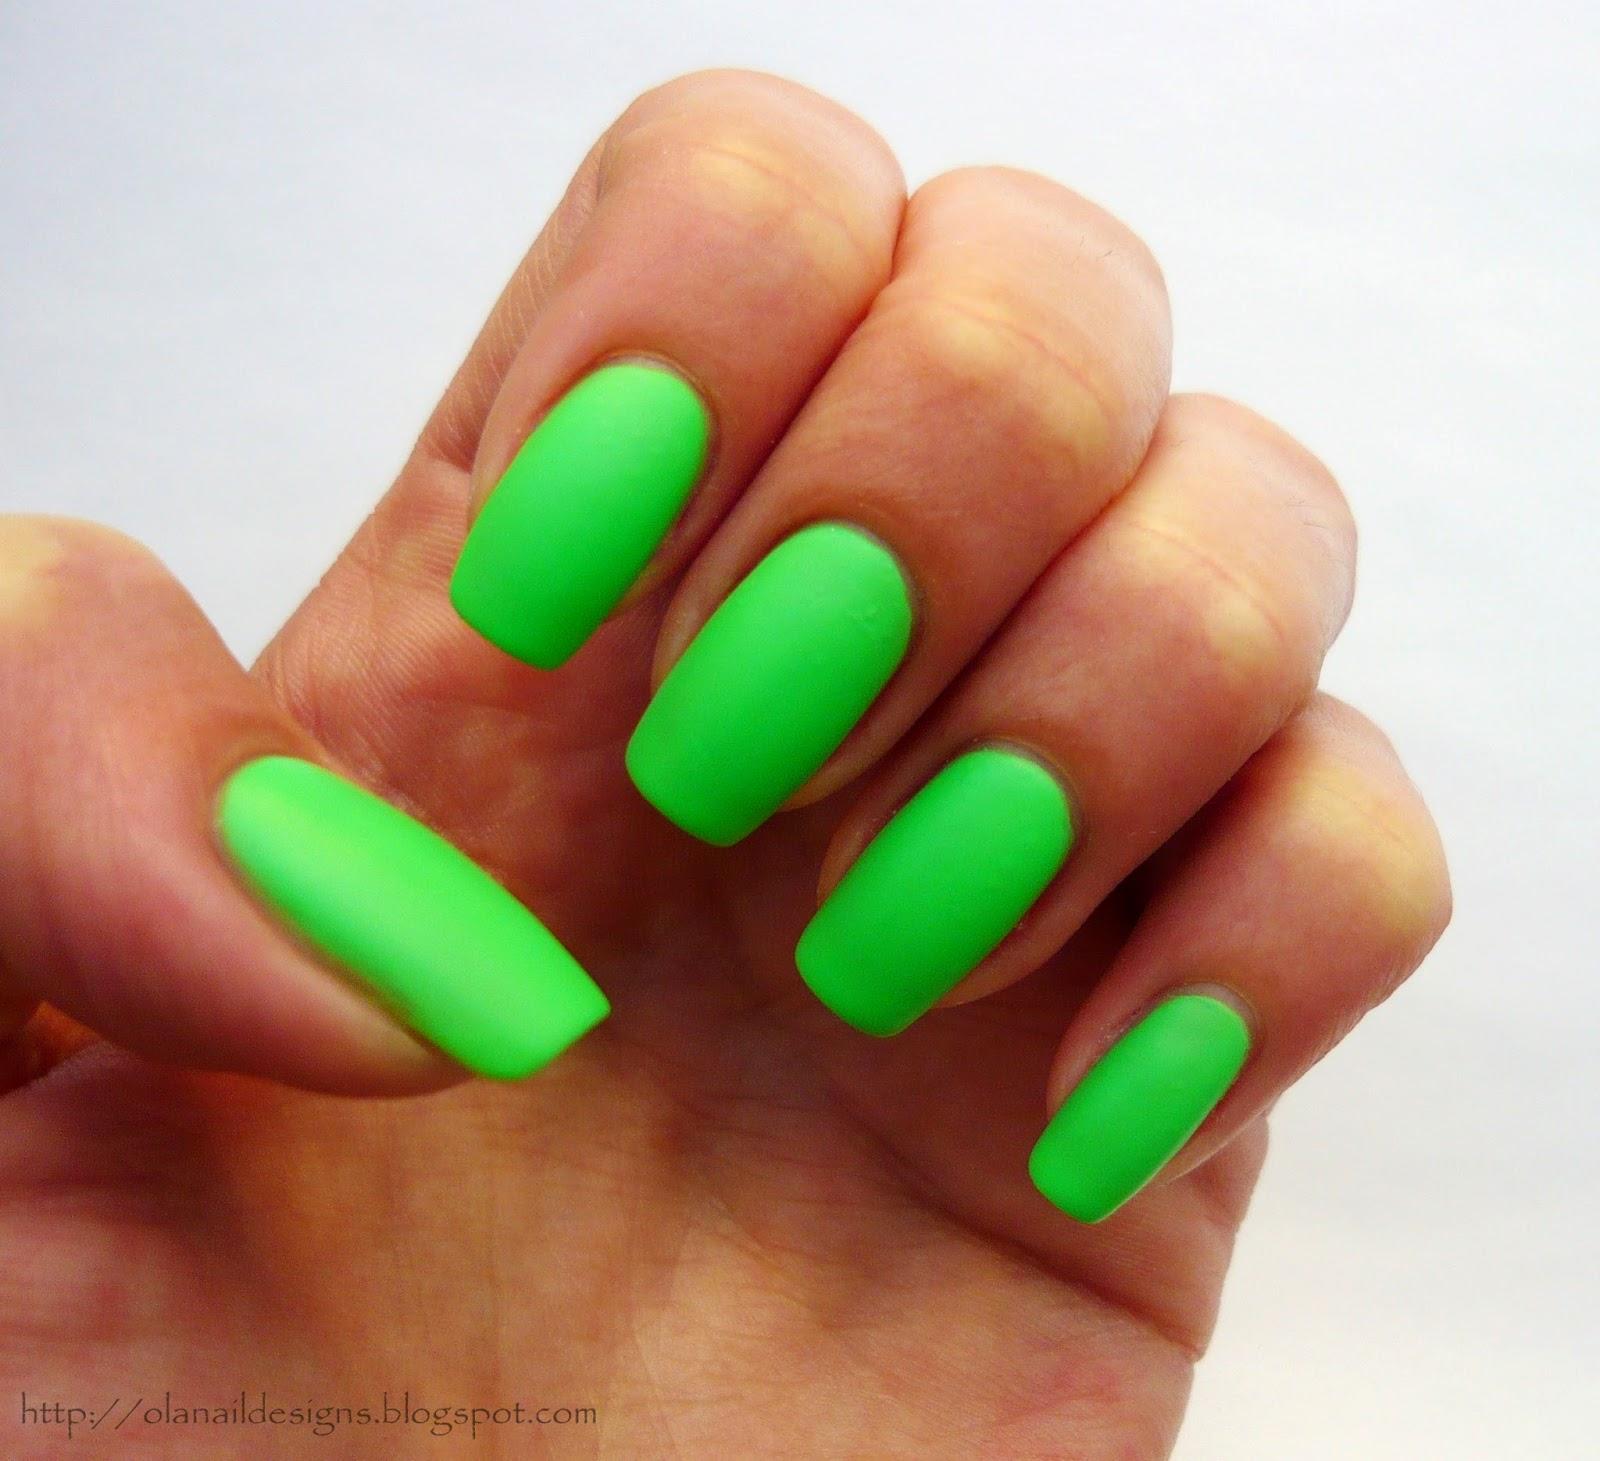 zielone matowe neonowe paznokcie